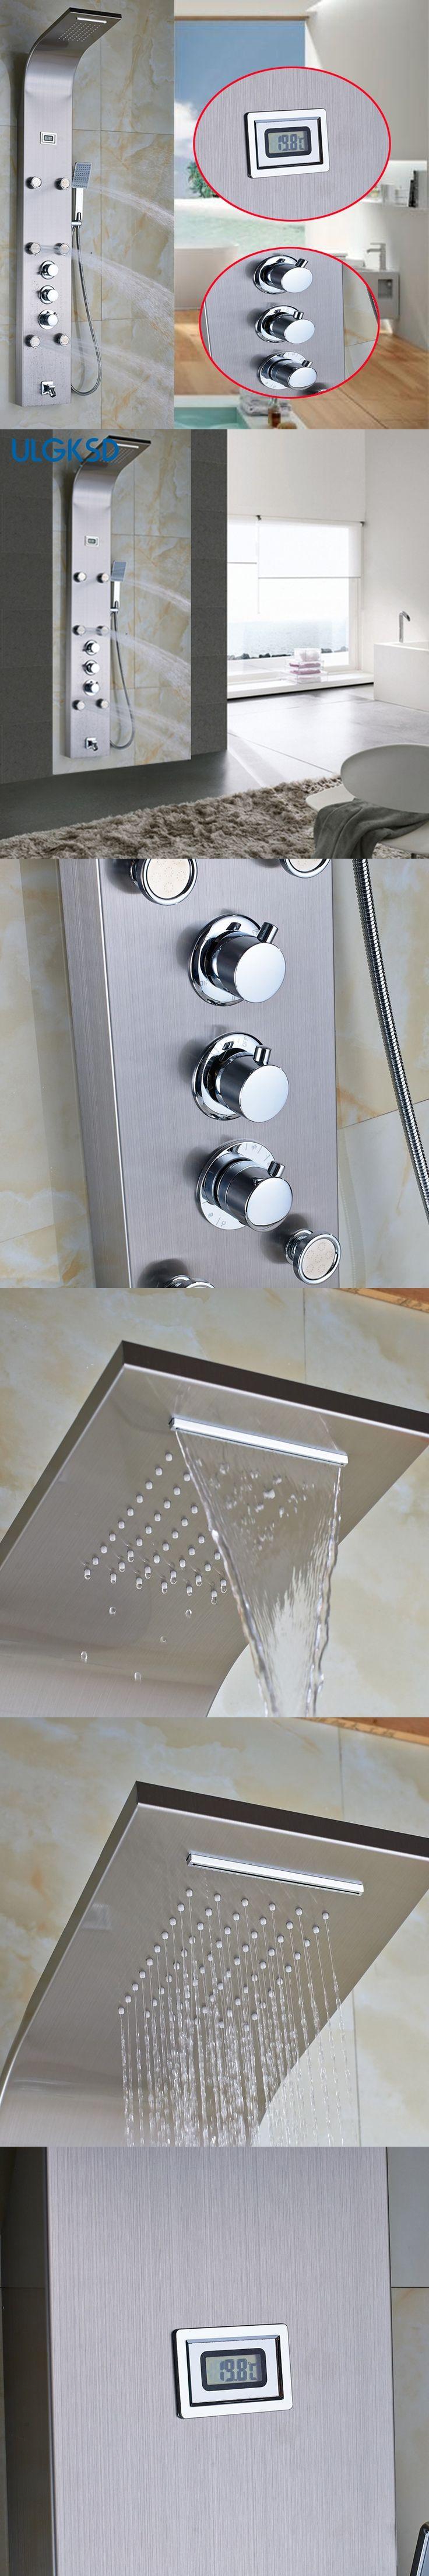 Ulgksd Thermostatic Shower Faucet Shower Column Digital Display 6ps Massage Jets Tub Faucet Filler Spout W/ Hand Shower Panel